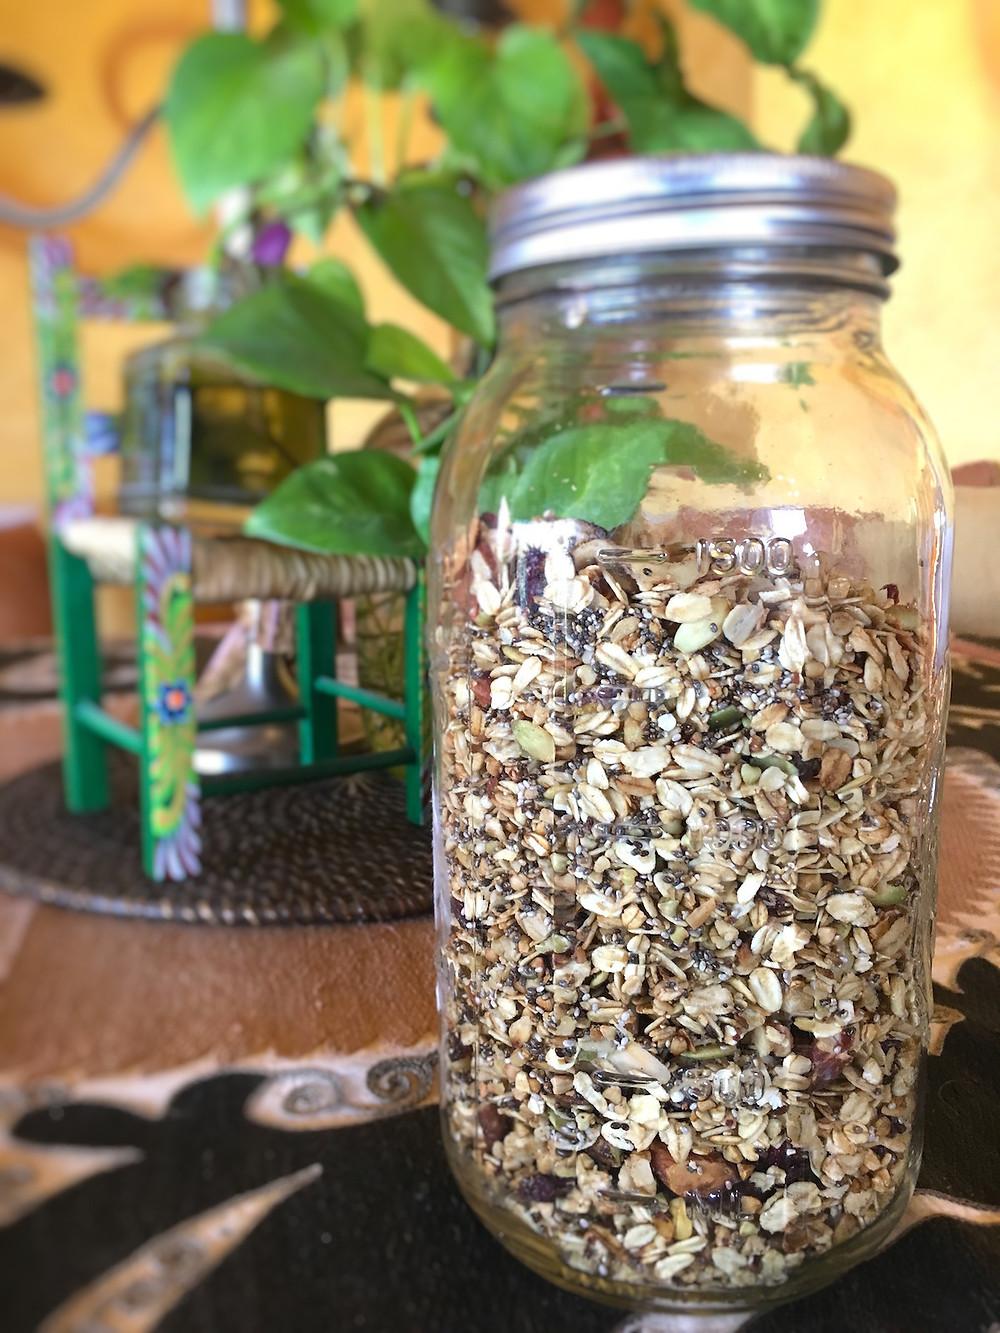 Home made granola in glass jar